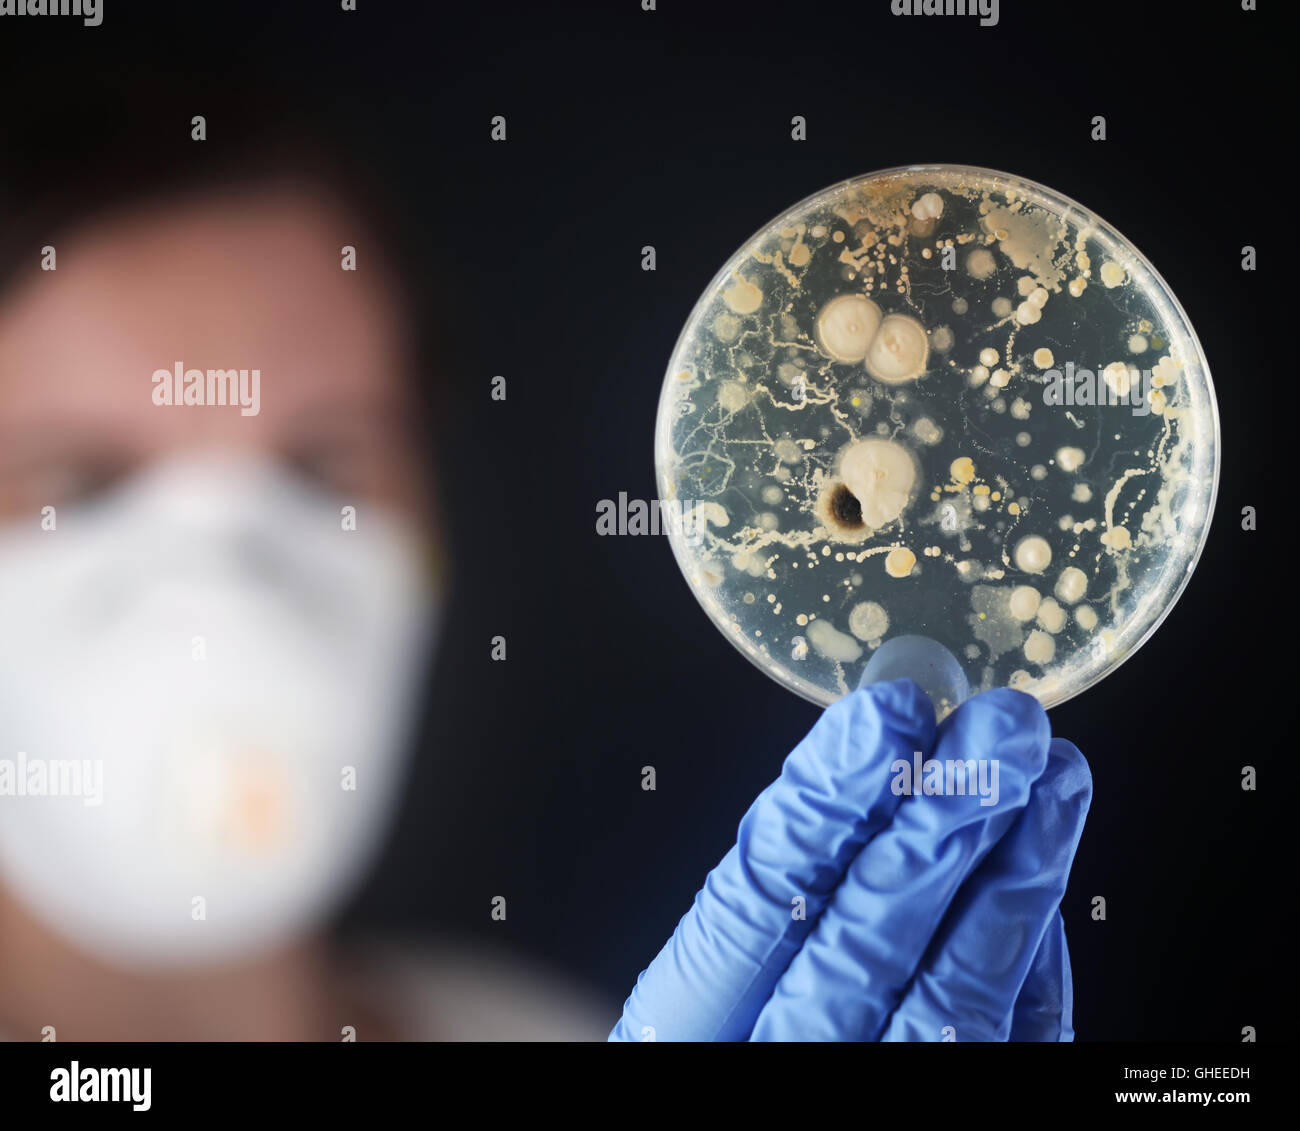 Examining bacteria in a petri dish - Stock Image